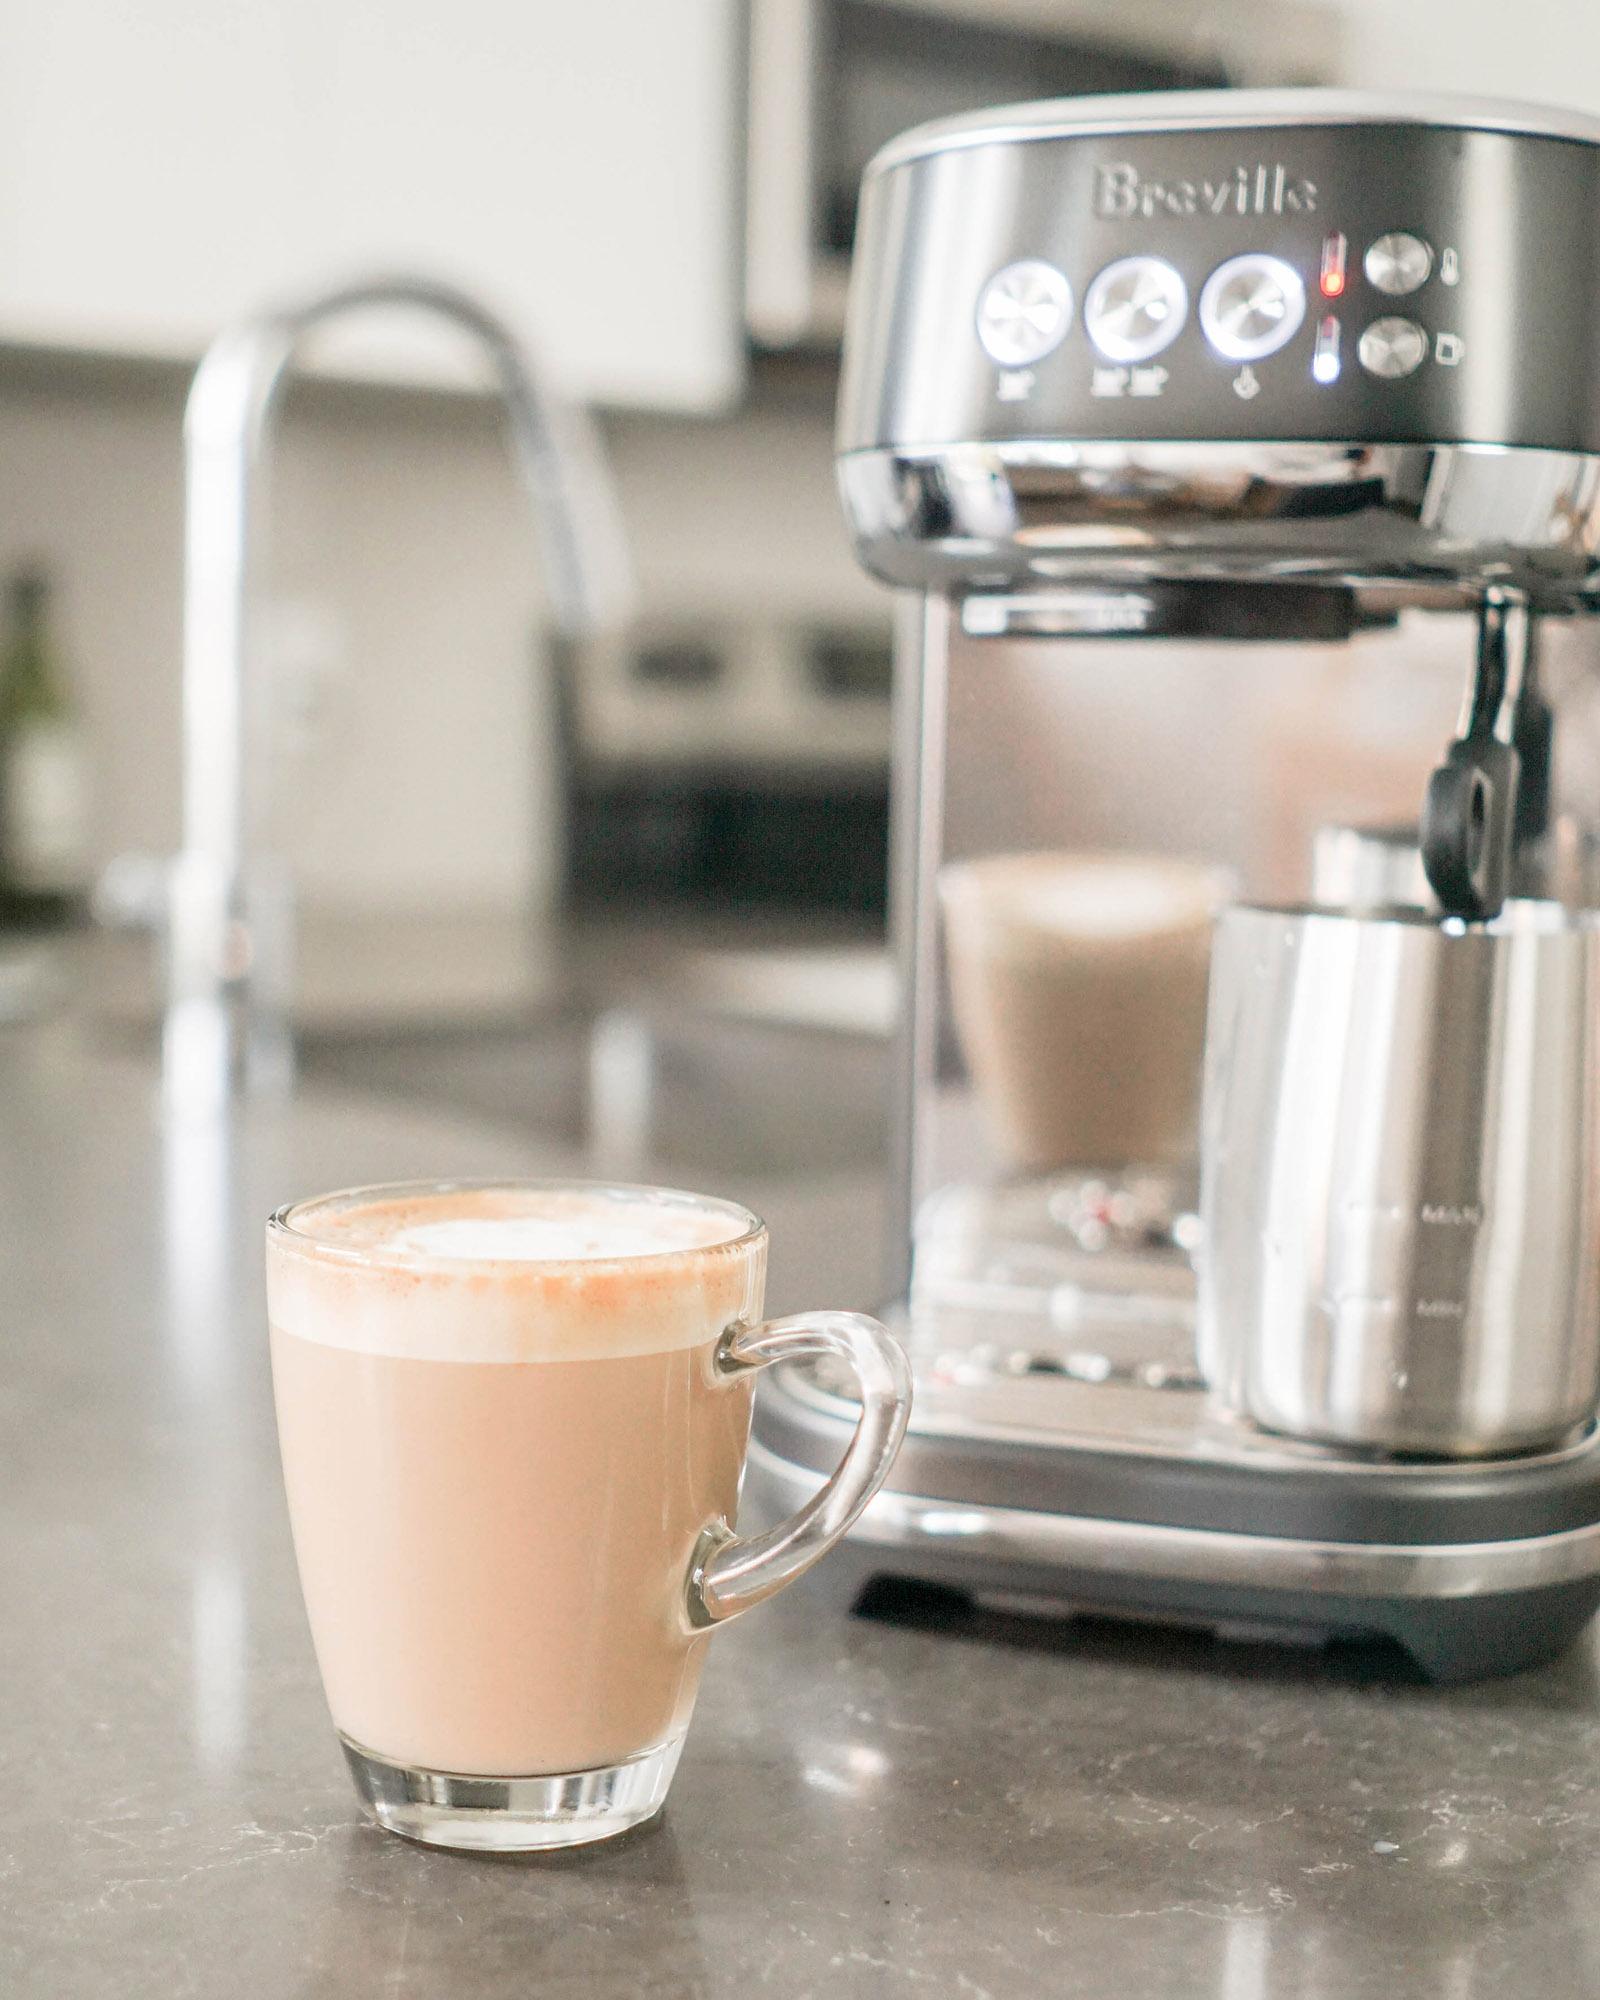 Breville Bambino Plus oat milk latte